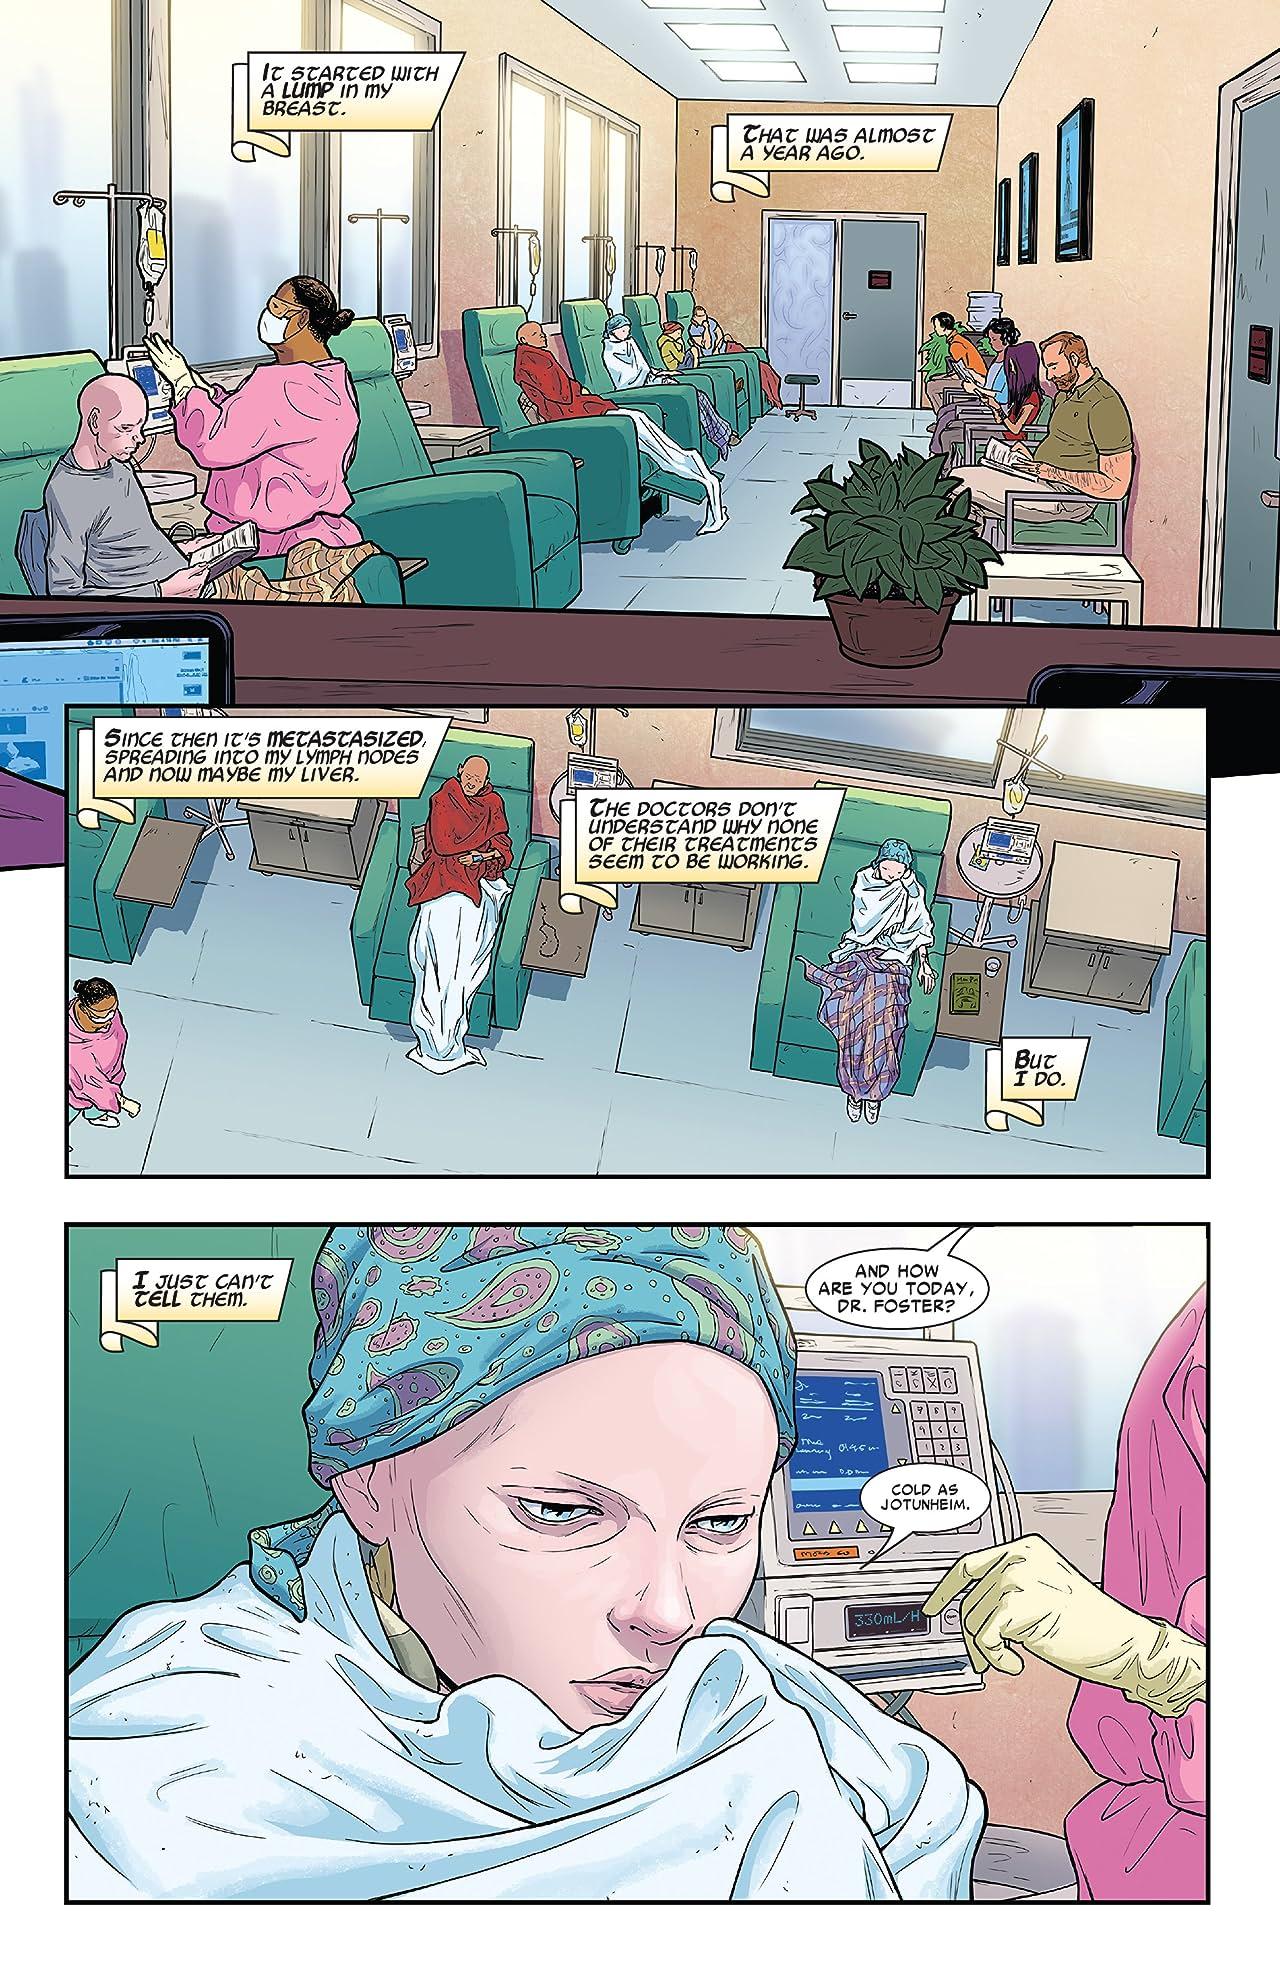 Thor by Jason Aaron & Russell Dauterman Vol. 2